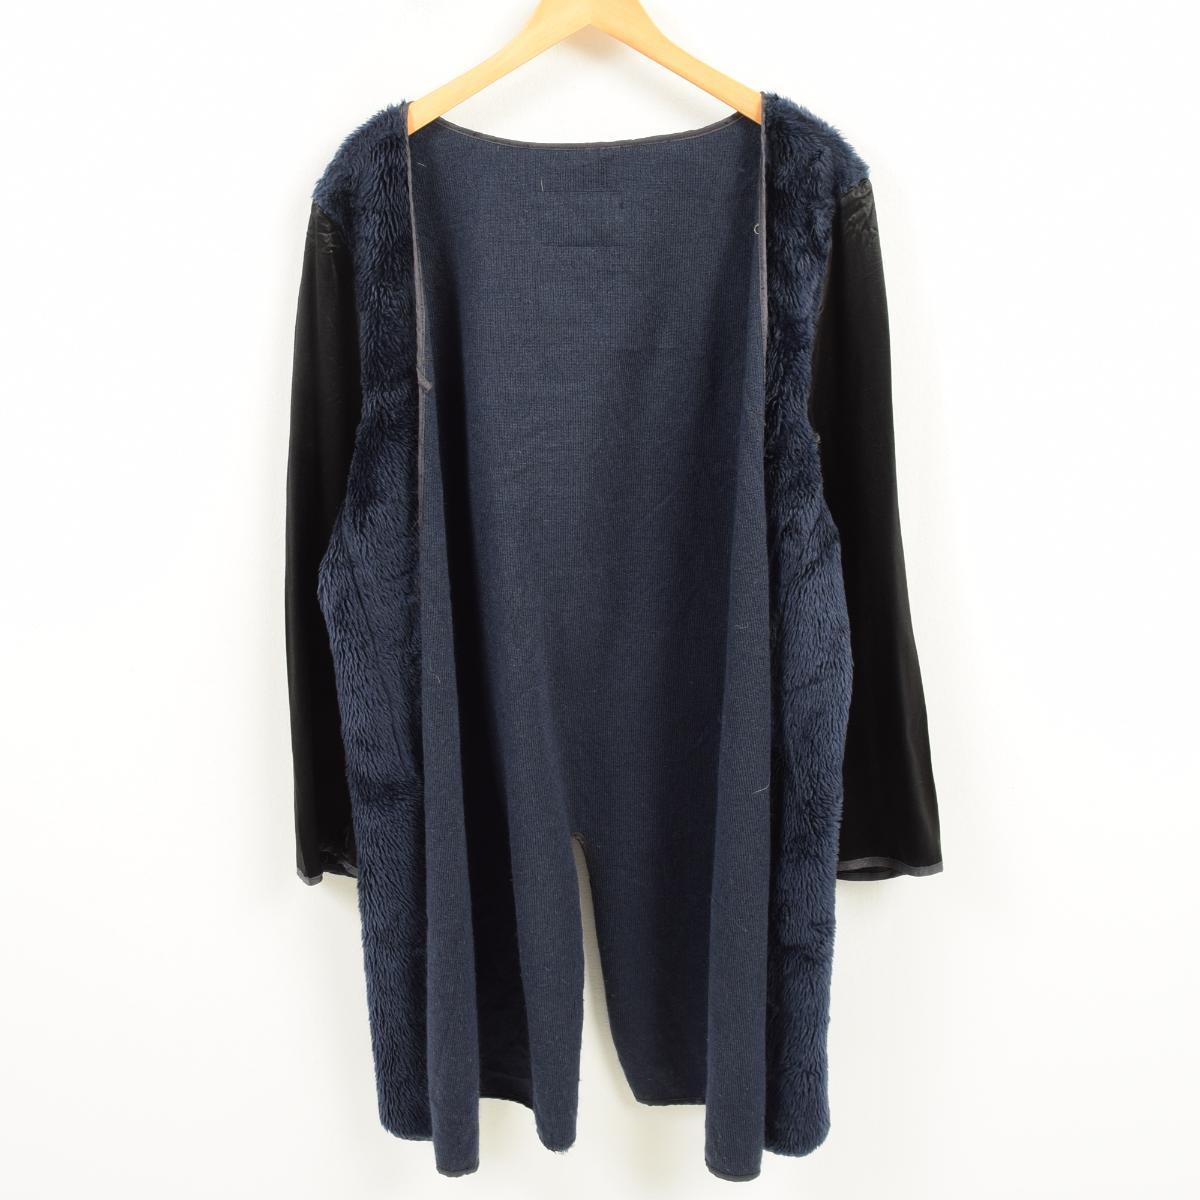 Vintage Clothing Jam Lady S L Wan8971 Made In Botany 500 Liner